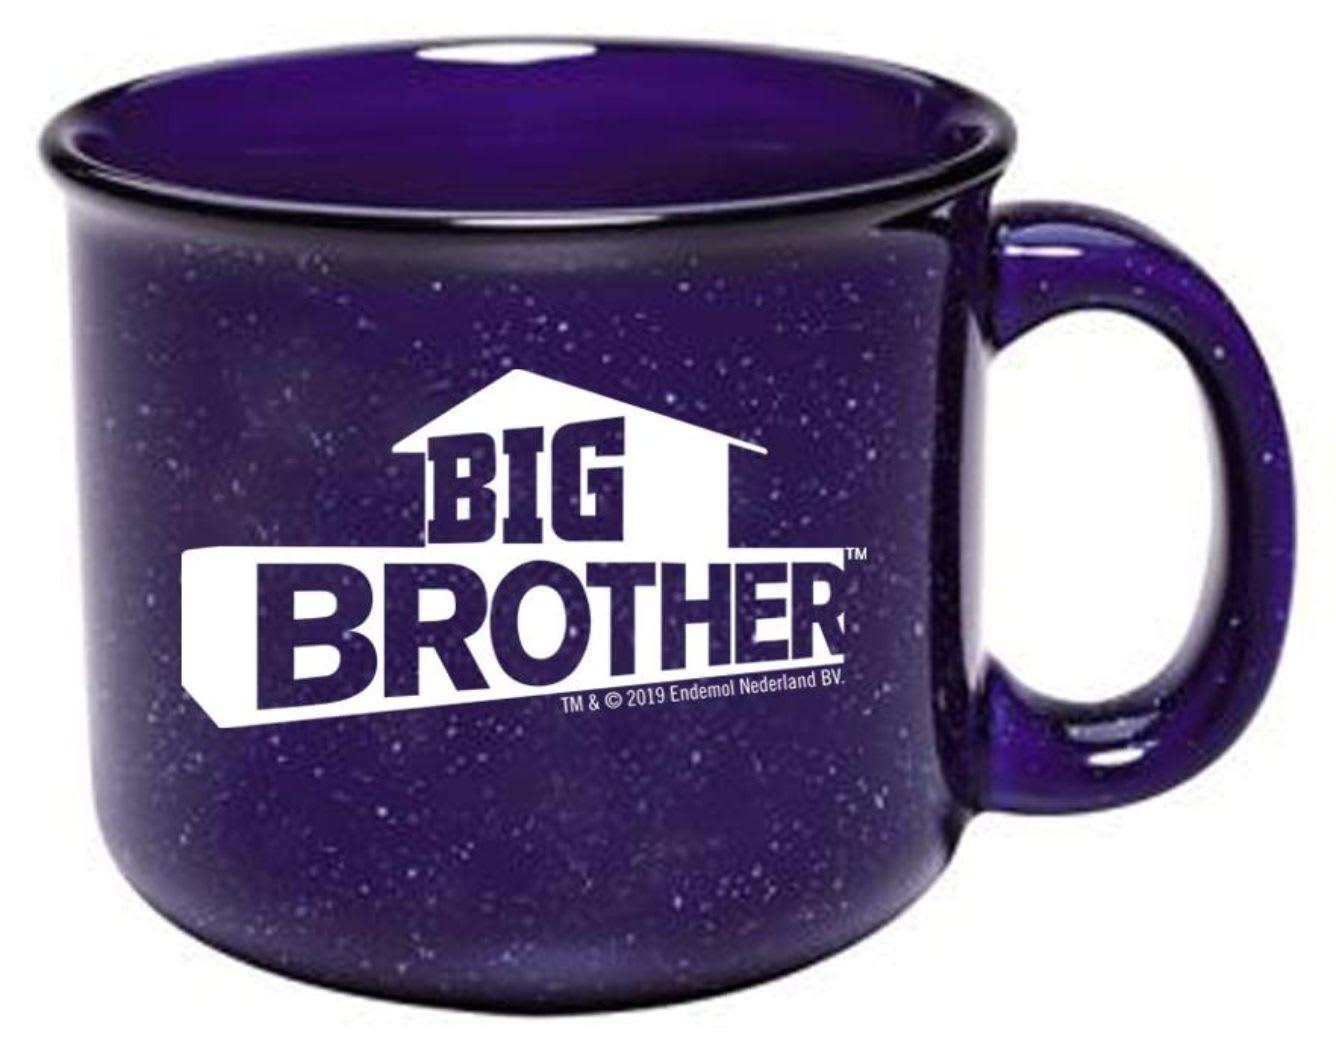 Discover CBS's logo campfire mug available on Amazon.